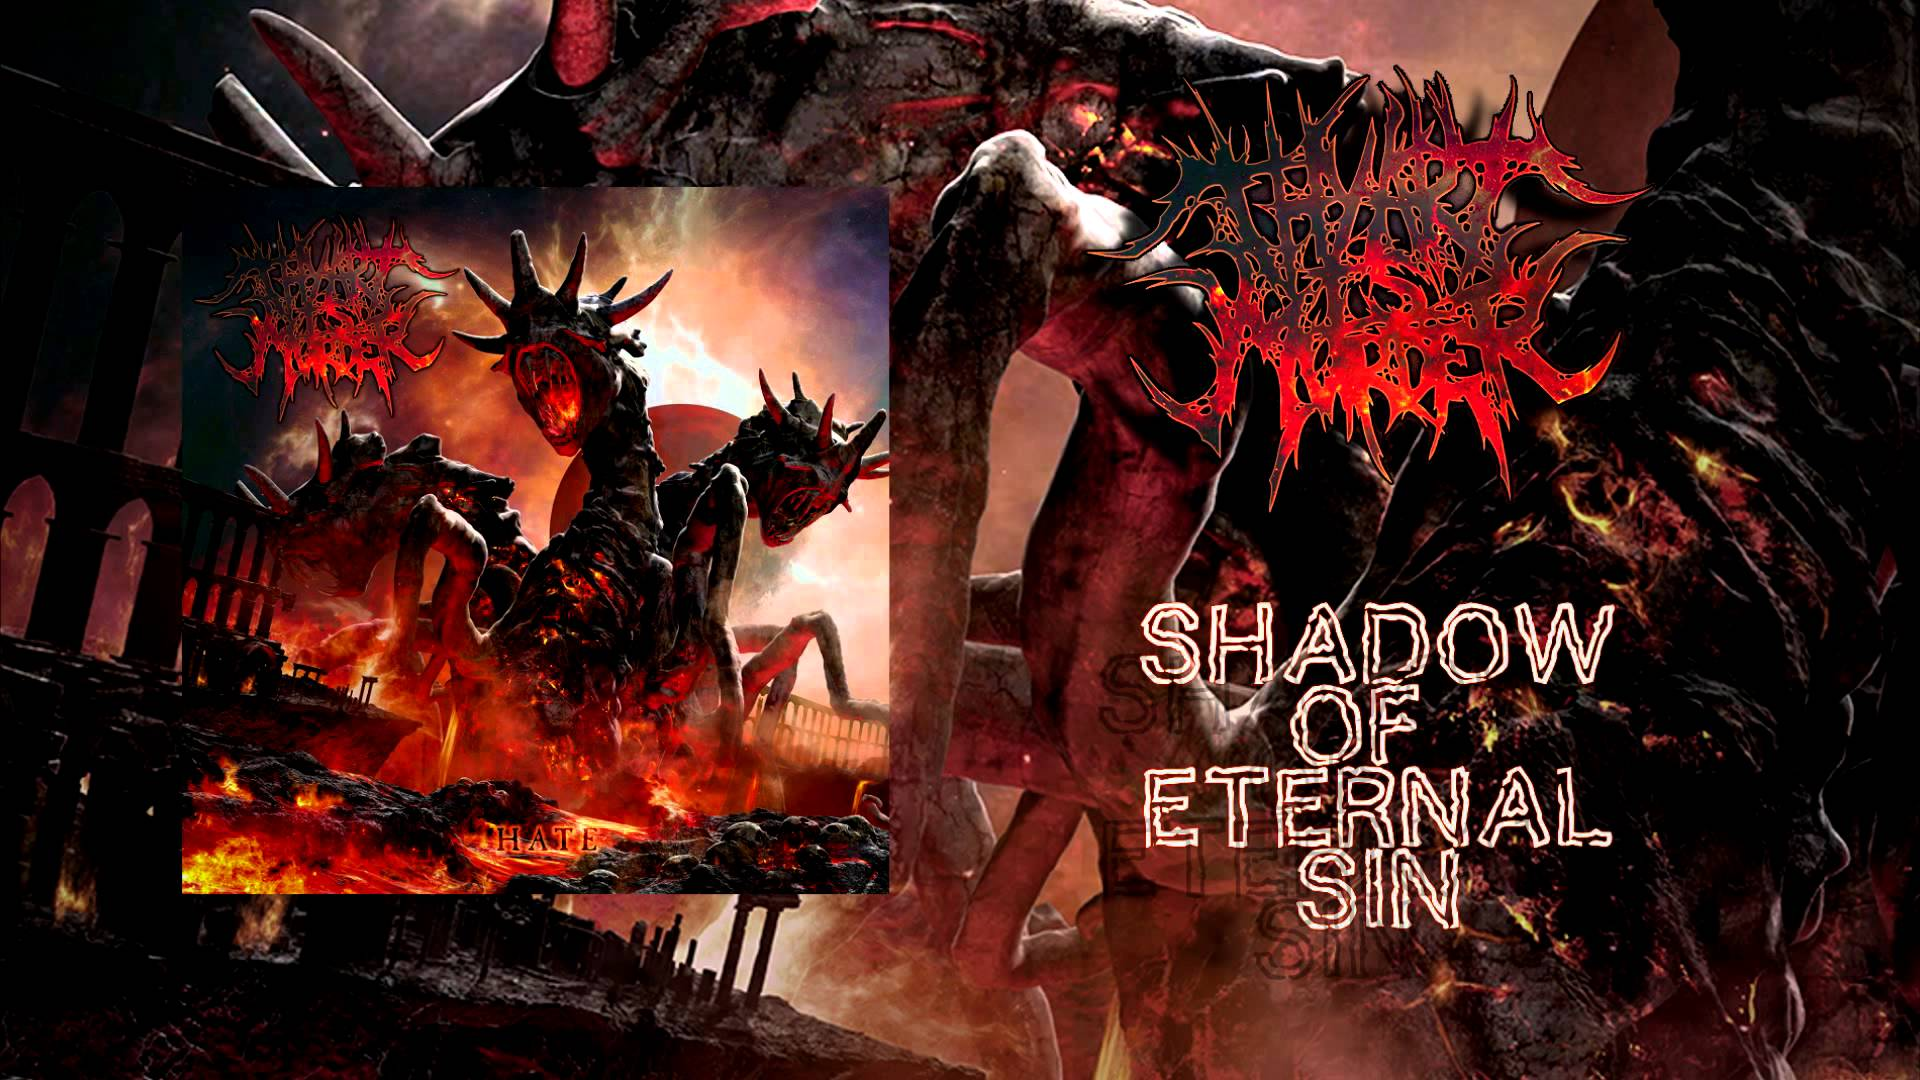 death metal art wallpaper wwwpixsharkcom images